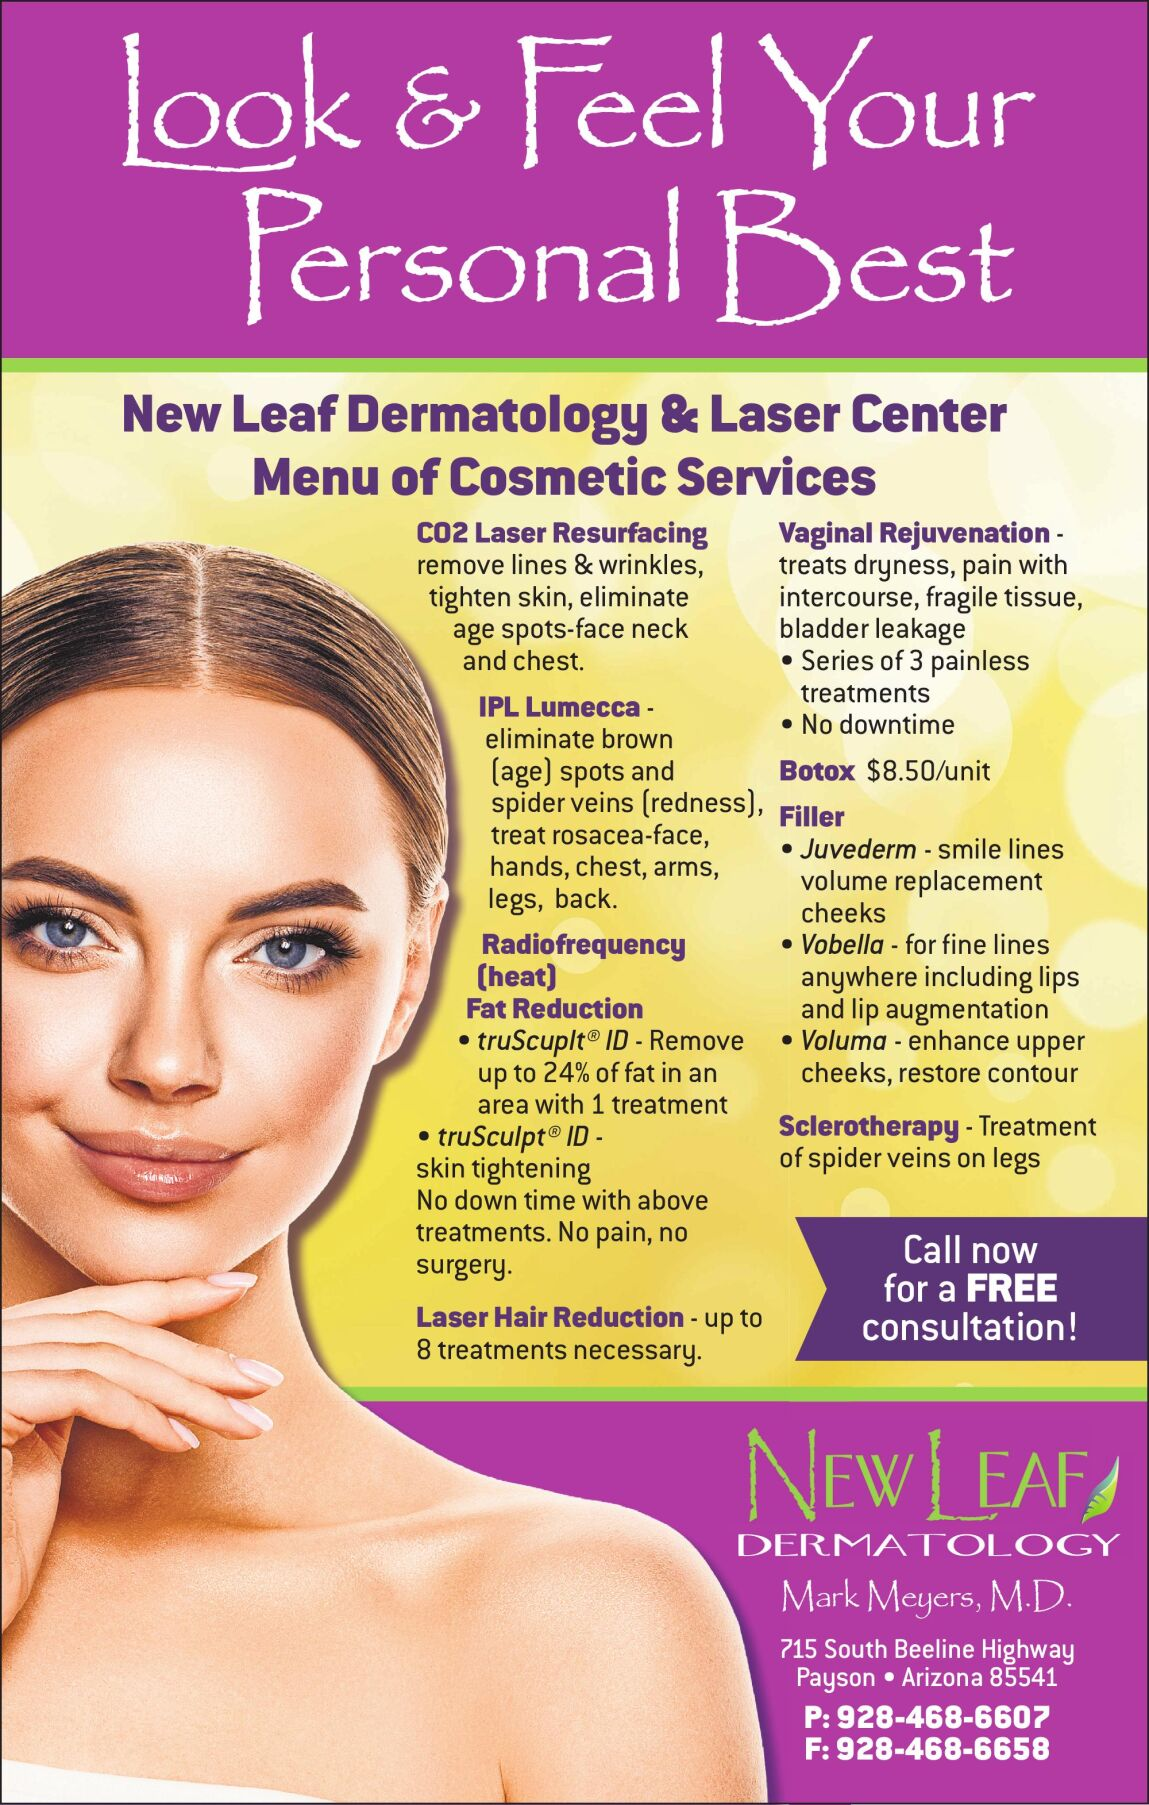 New Leaf Dermatology